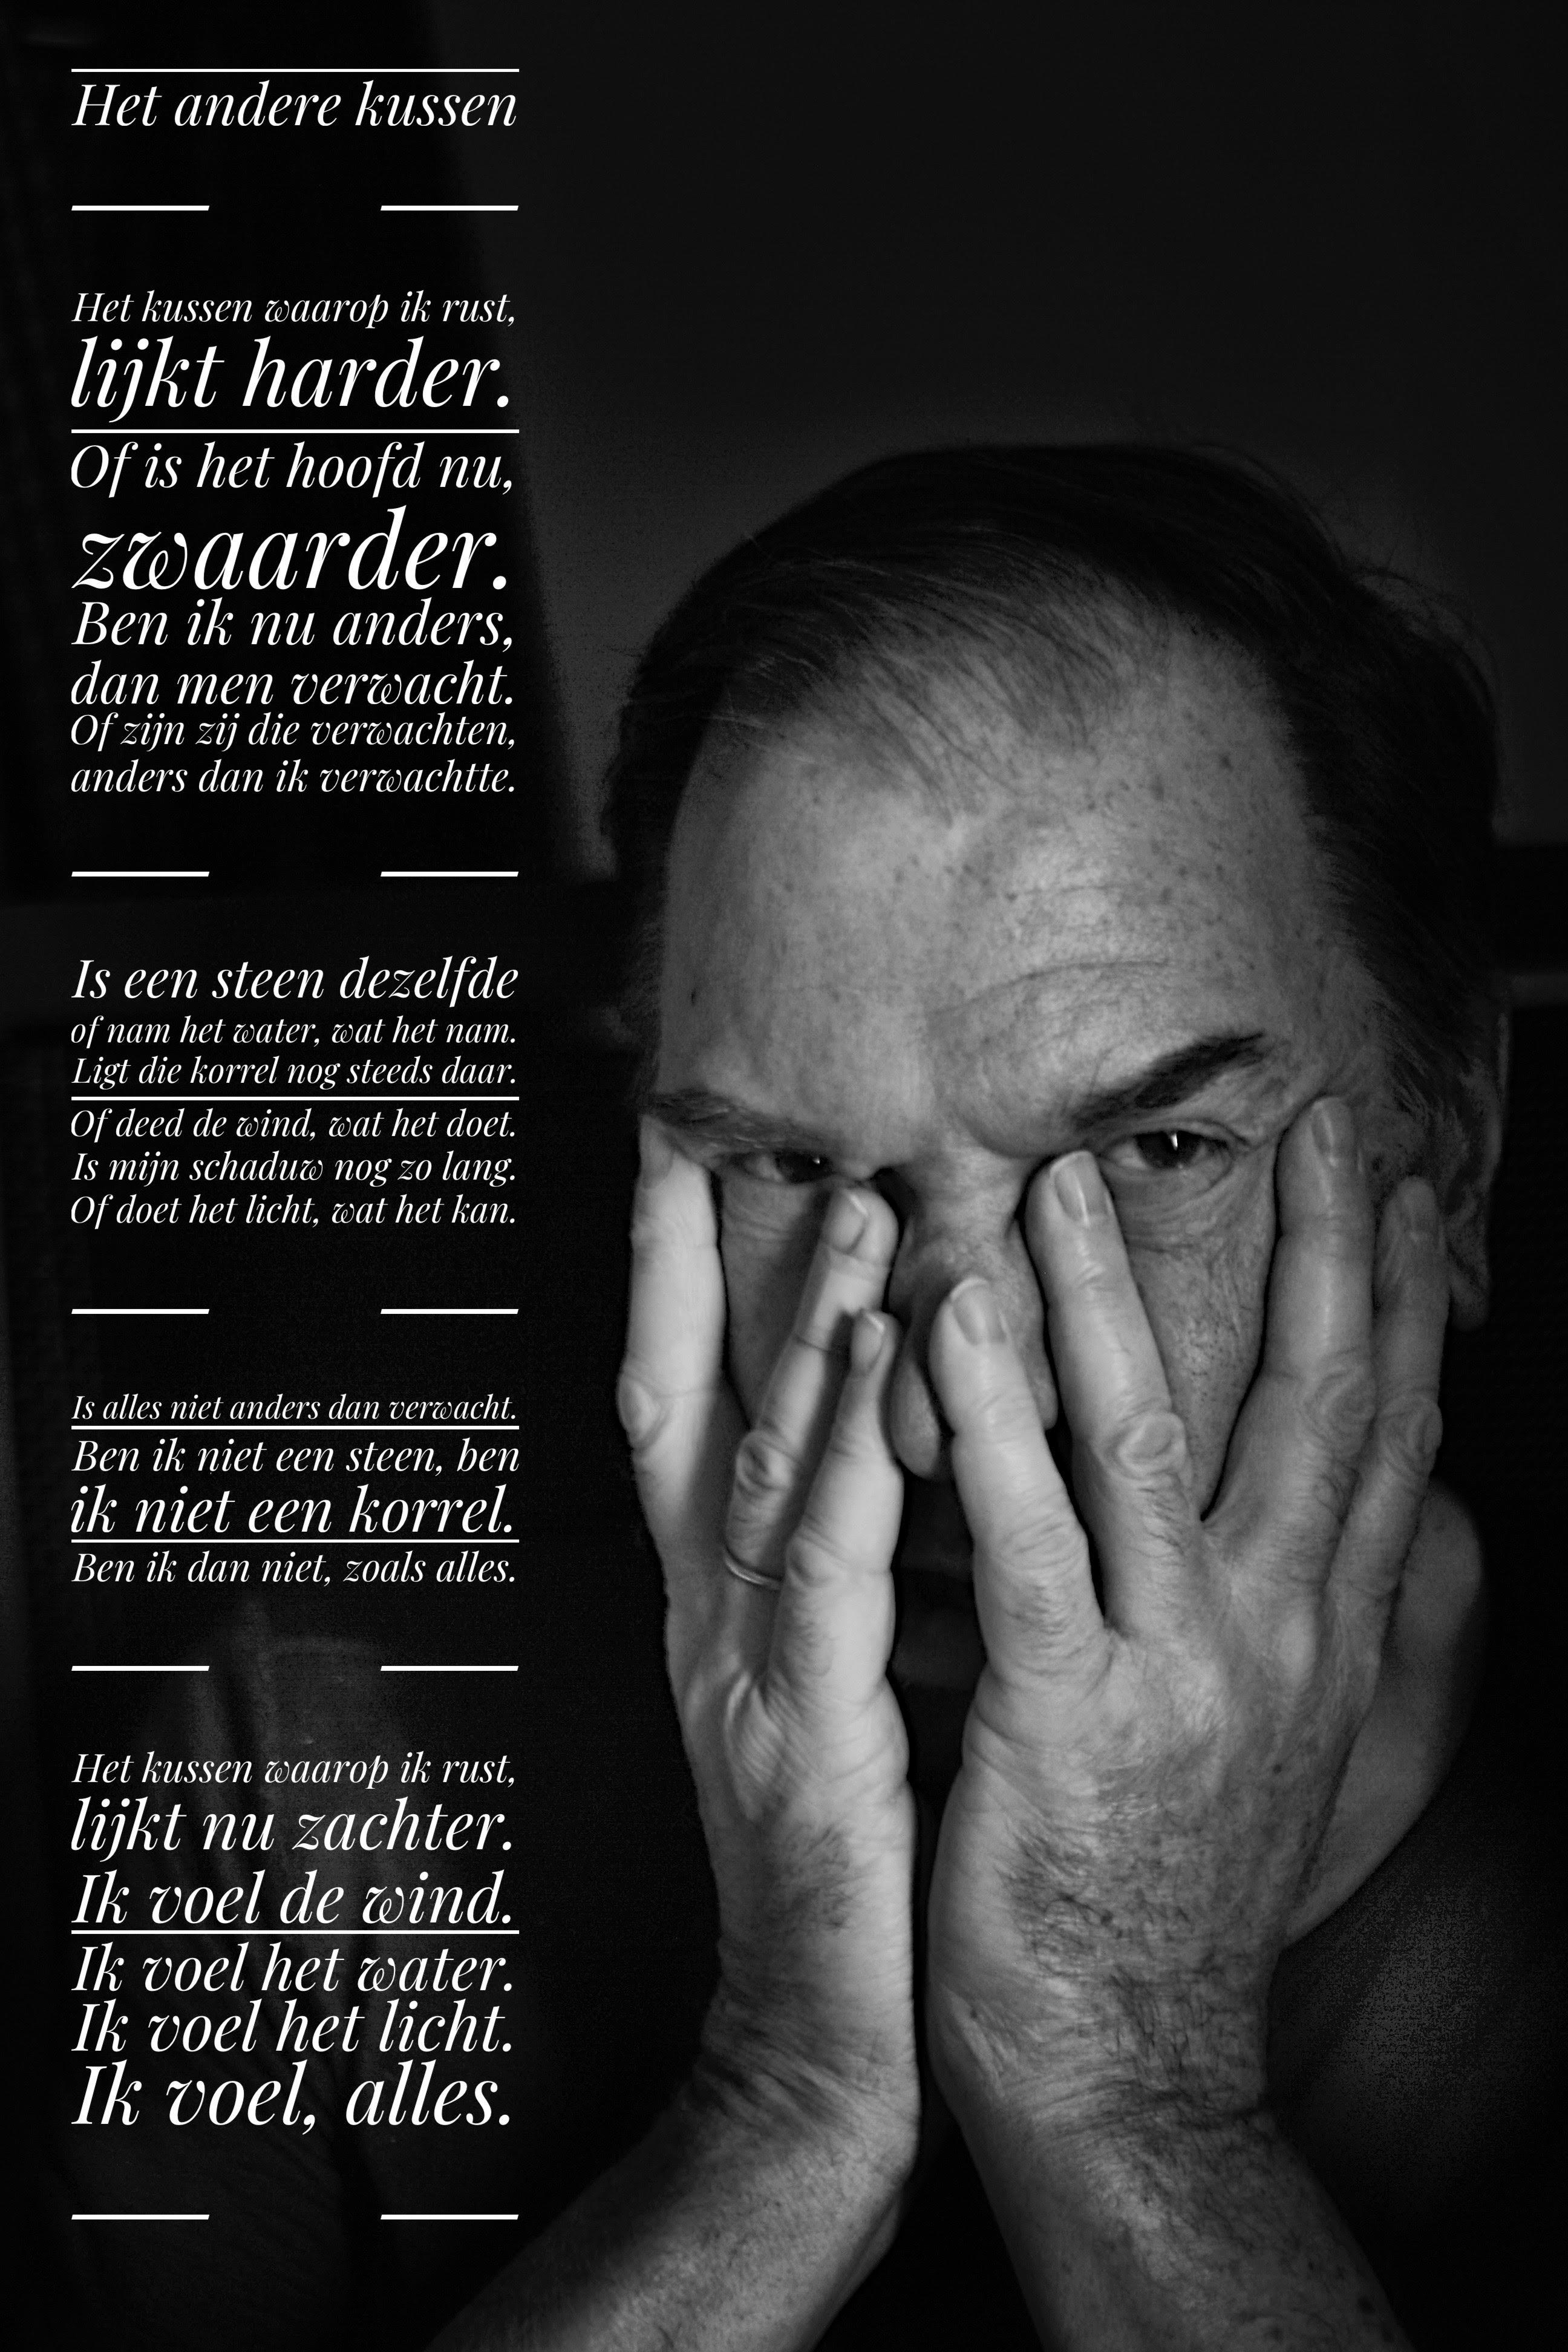 Het andere kussen – Tekst: ©Patrick Bervoets en foto: Yves Lorson